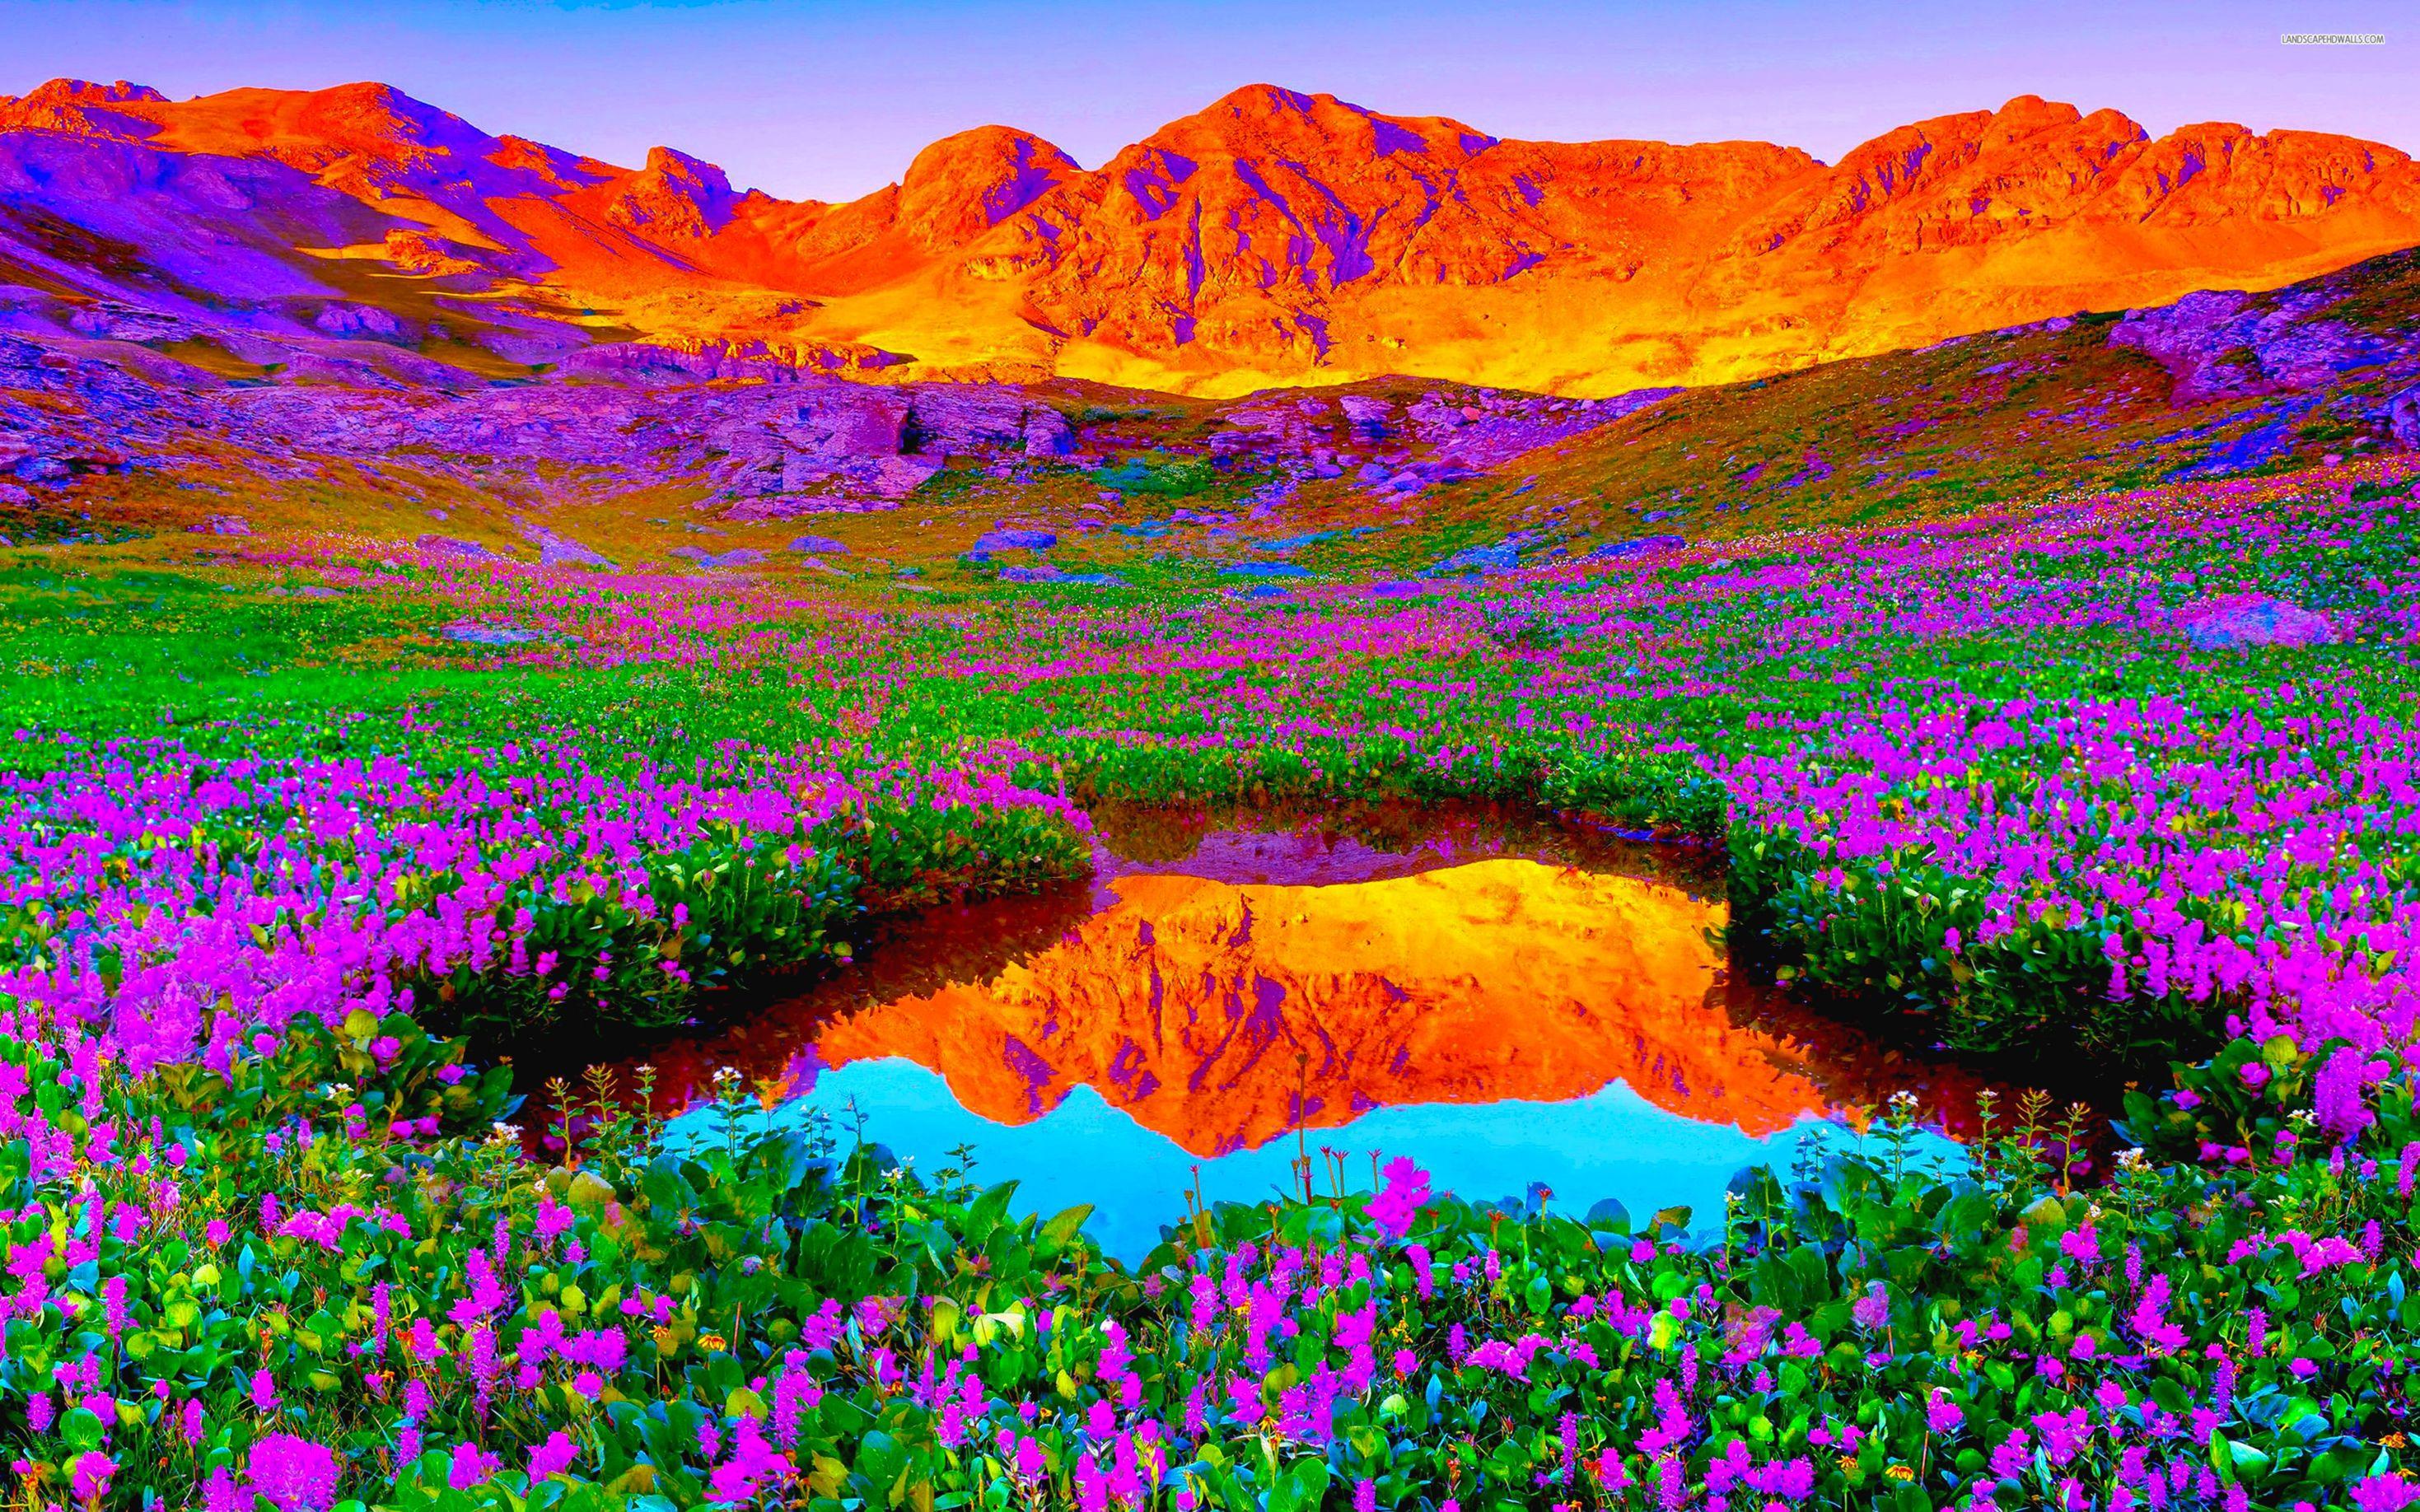 Vibrant desktop backgrounds google search fresh - Vibrant background ...